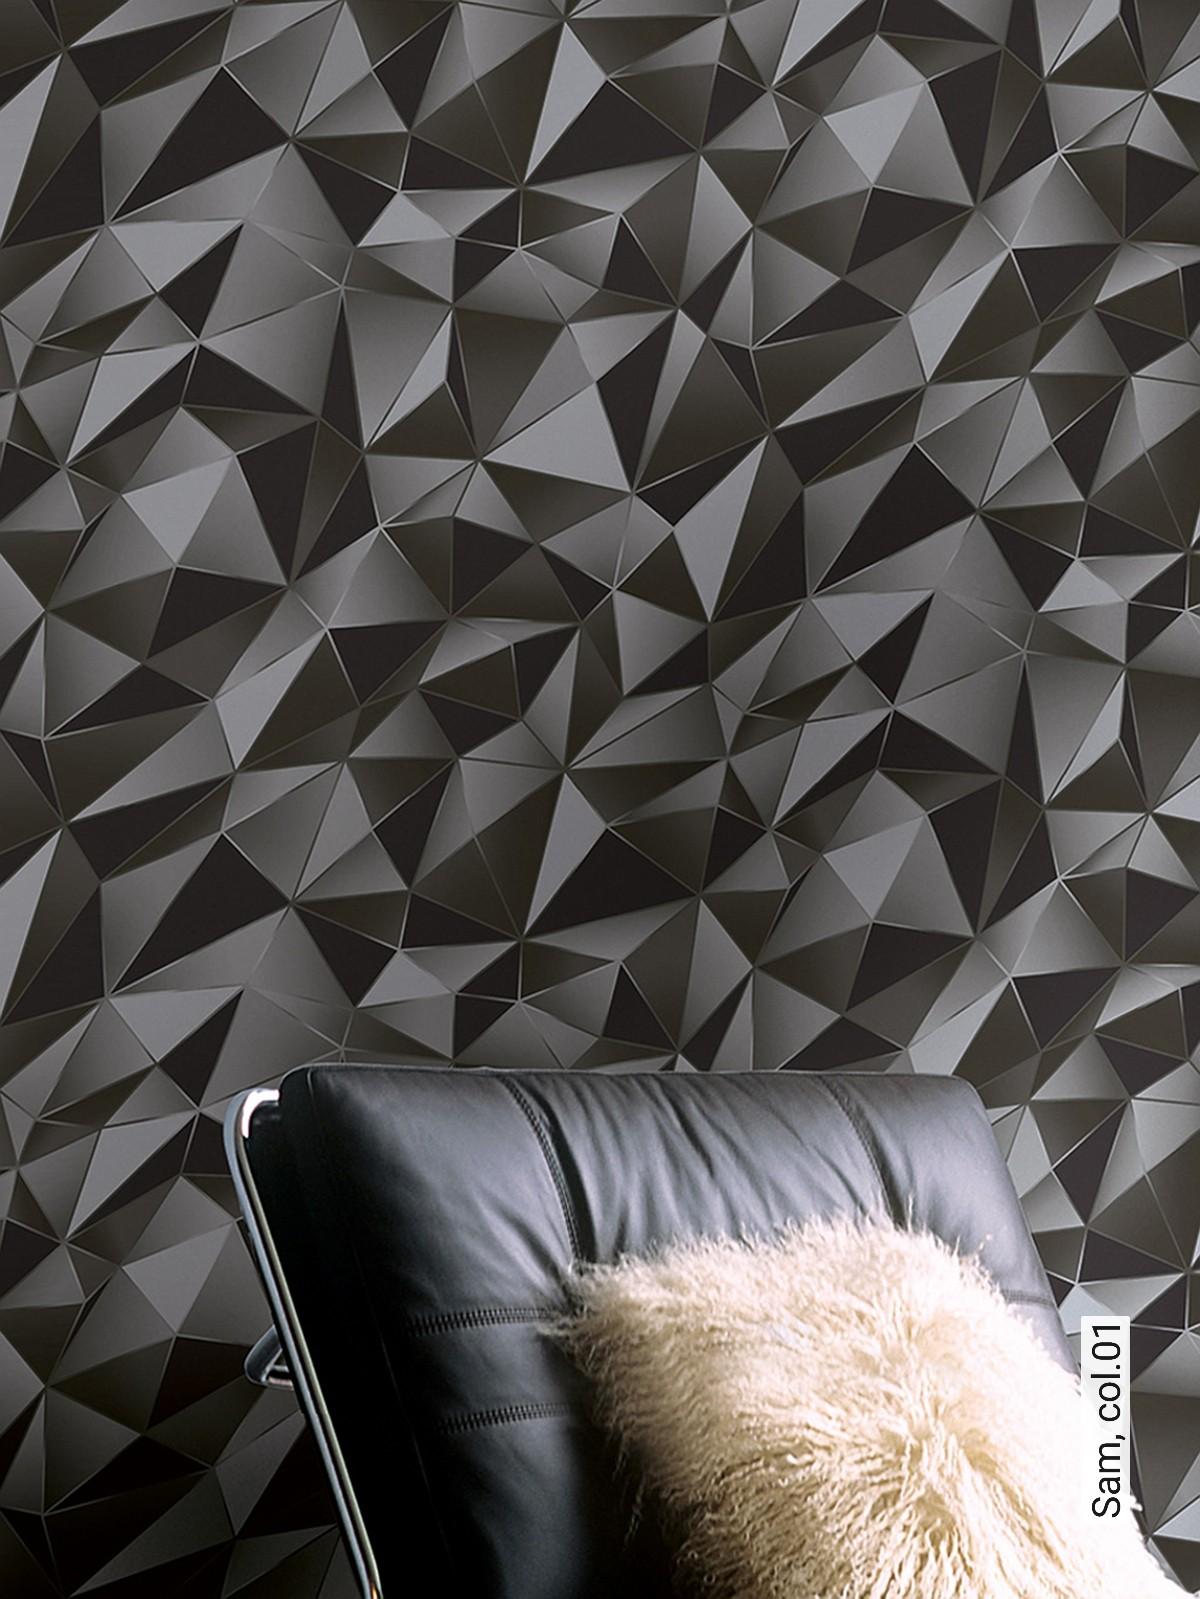 tapete sam die tapetenagentur. Black Bedroom Furniture Sets. Home Design Ideas